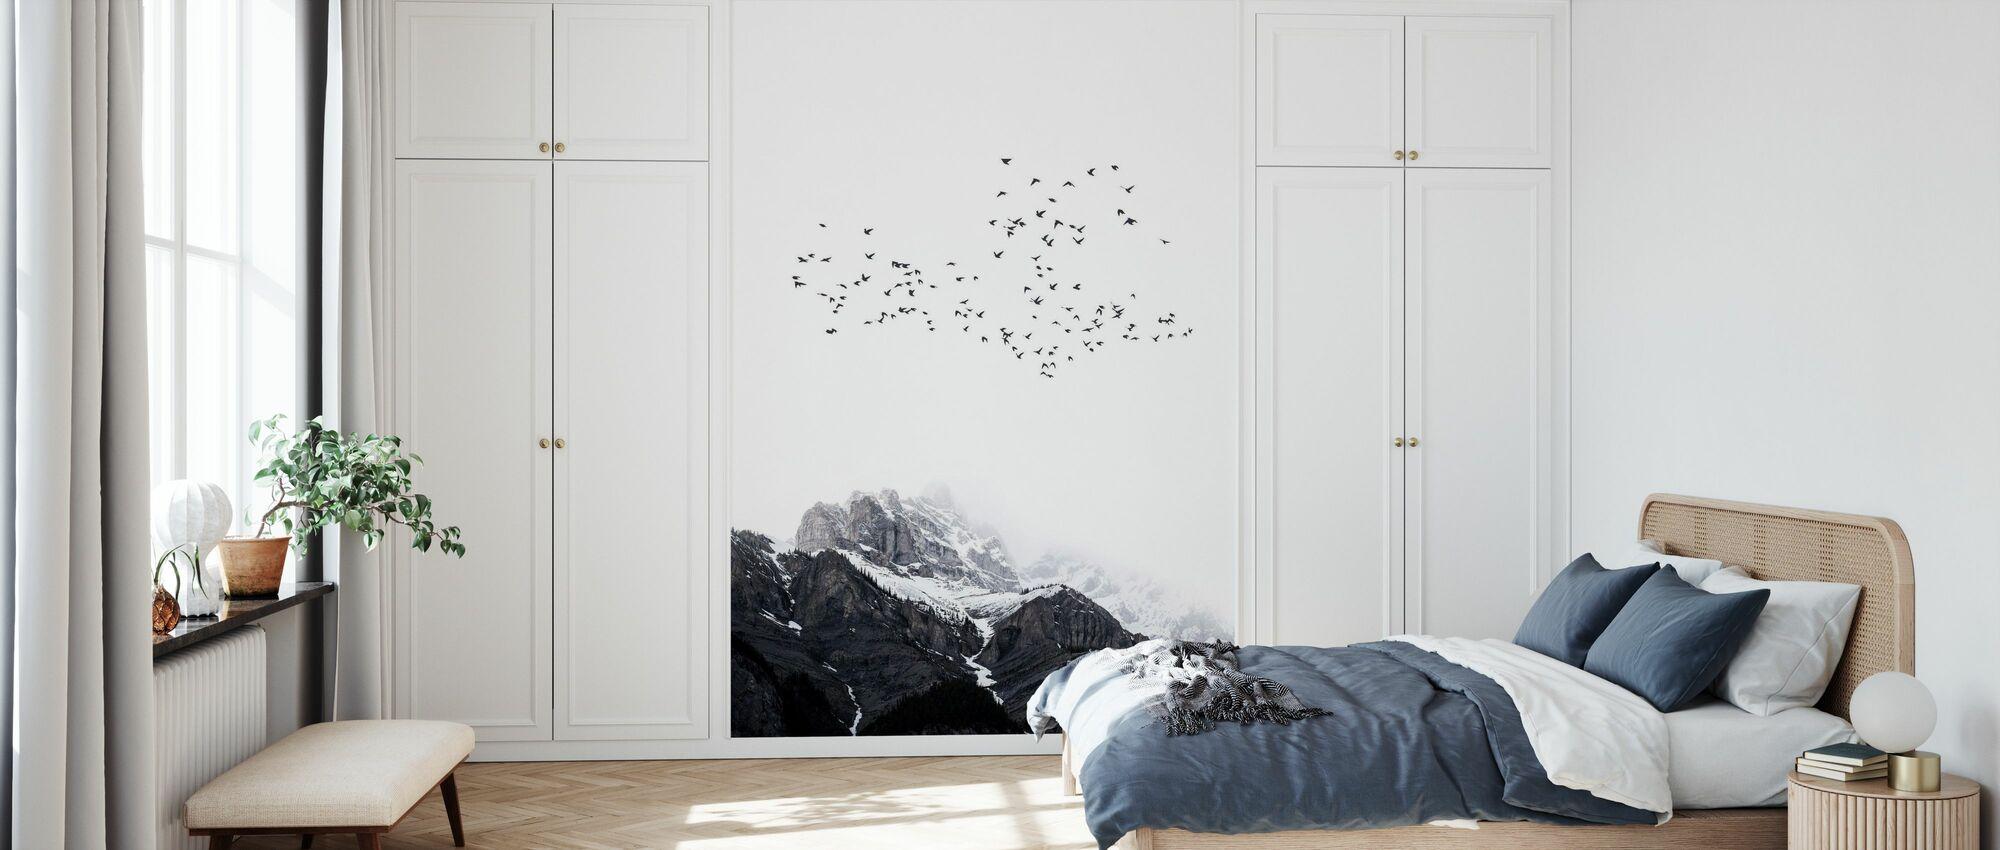 Maailman huippu - Tapetti - Makuuhuone